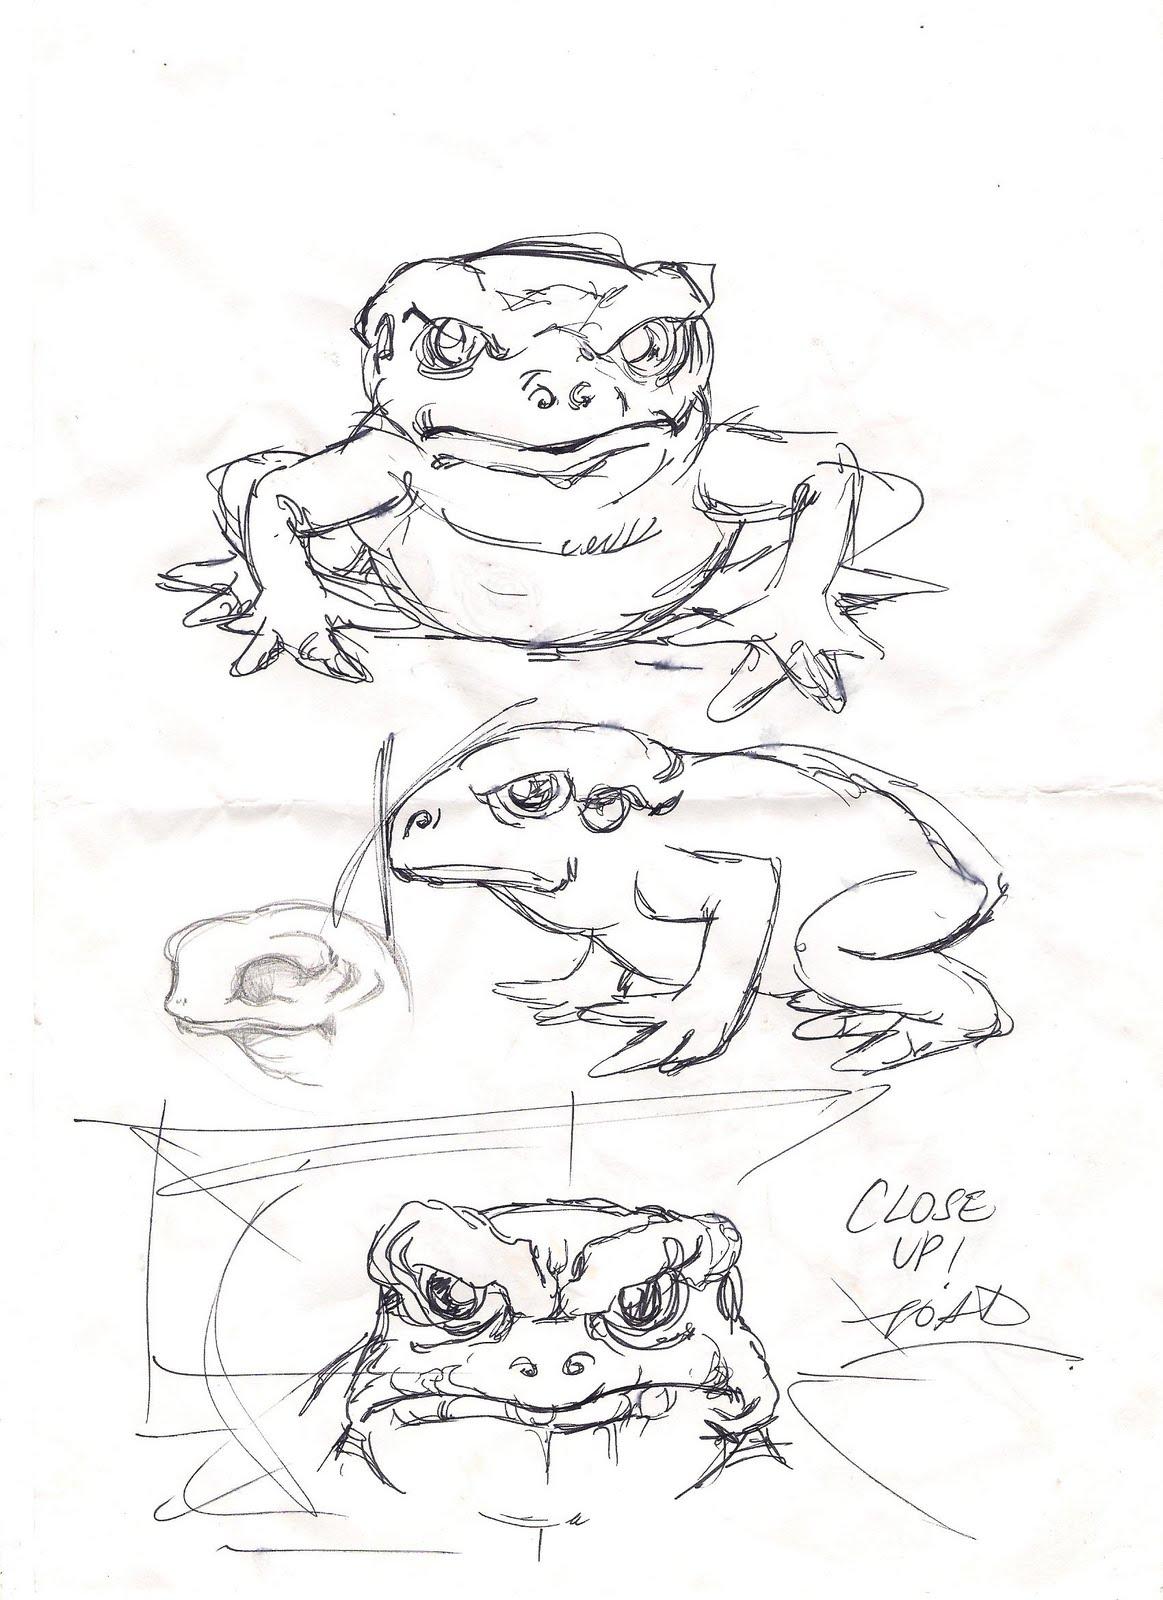 Drawn toad road milestone Richard ( ) journal Stanley's